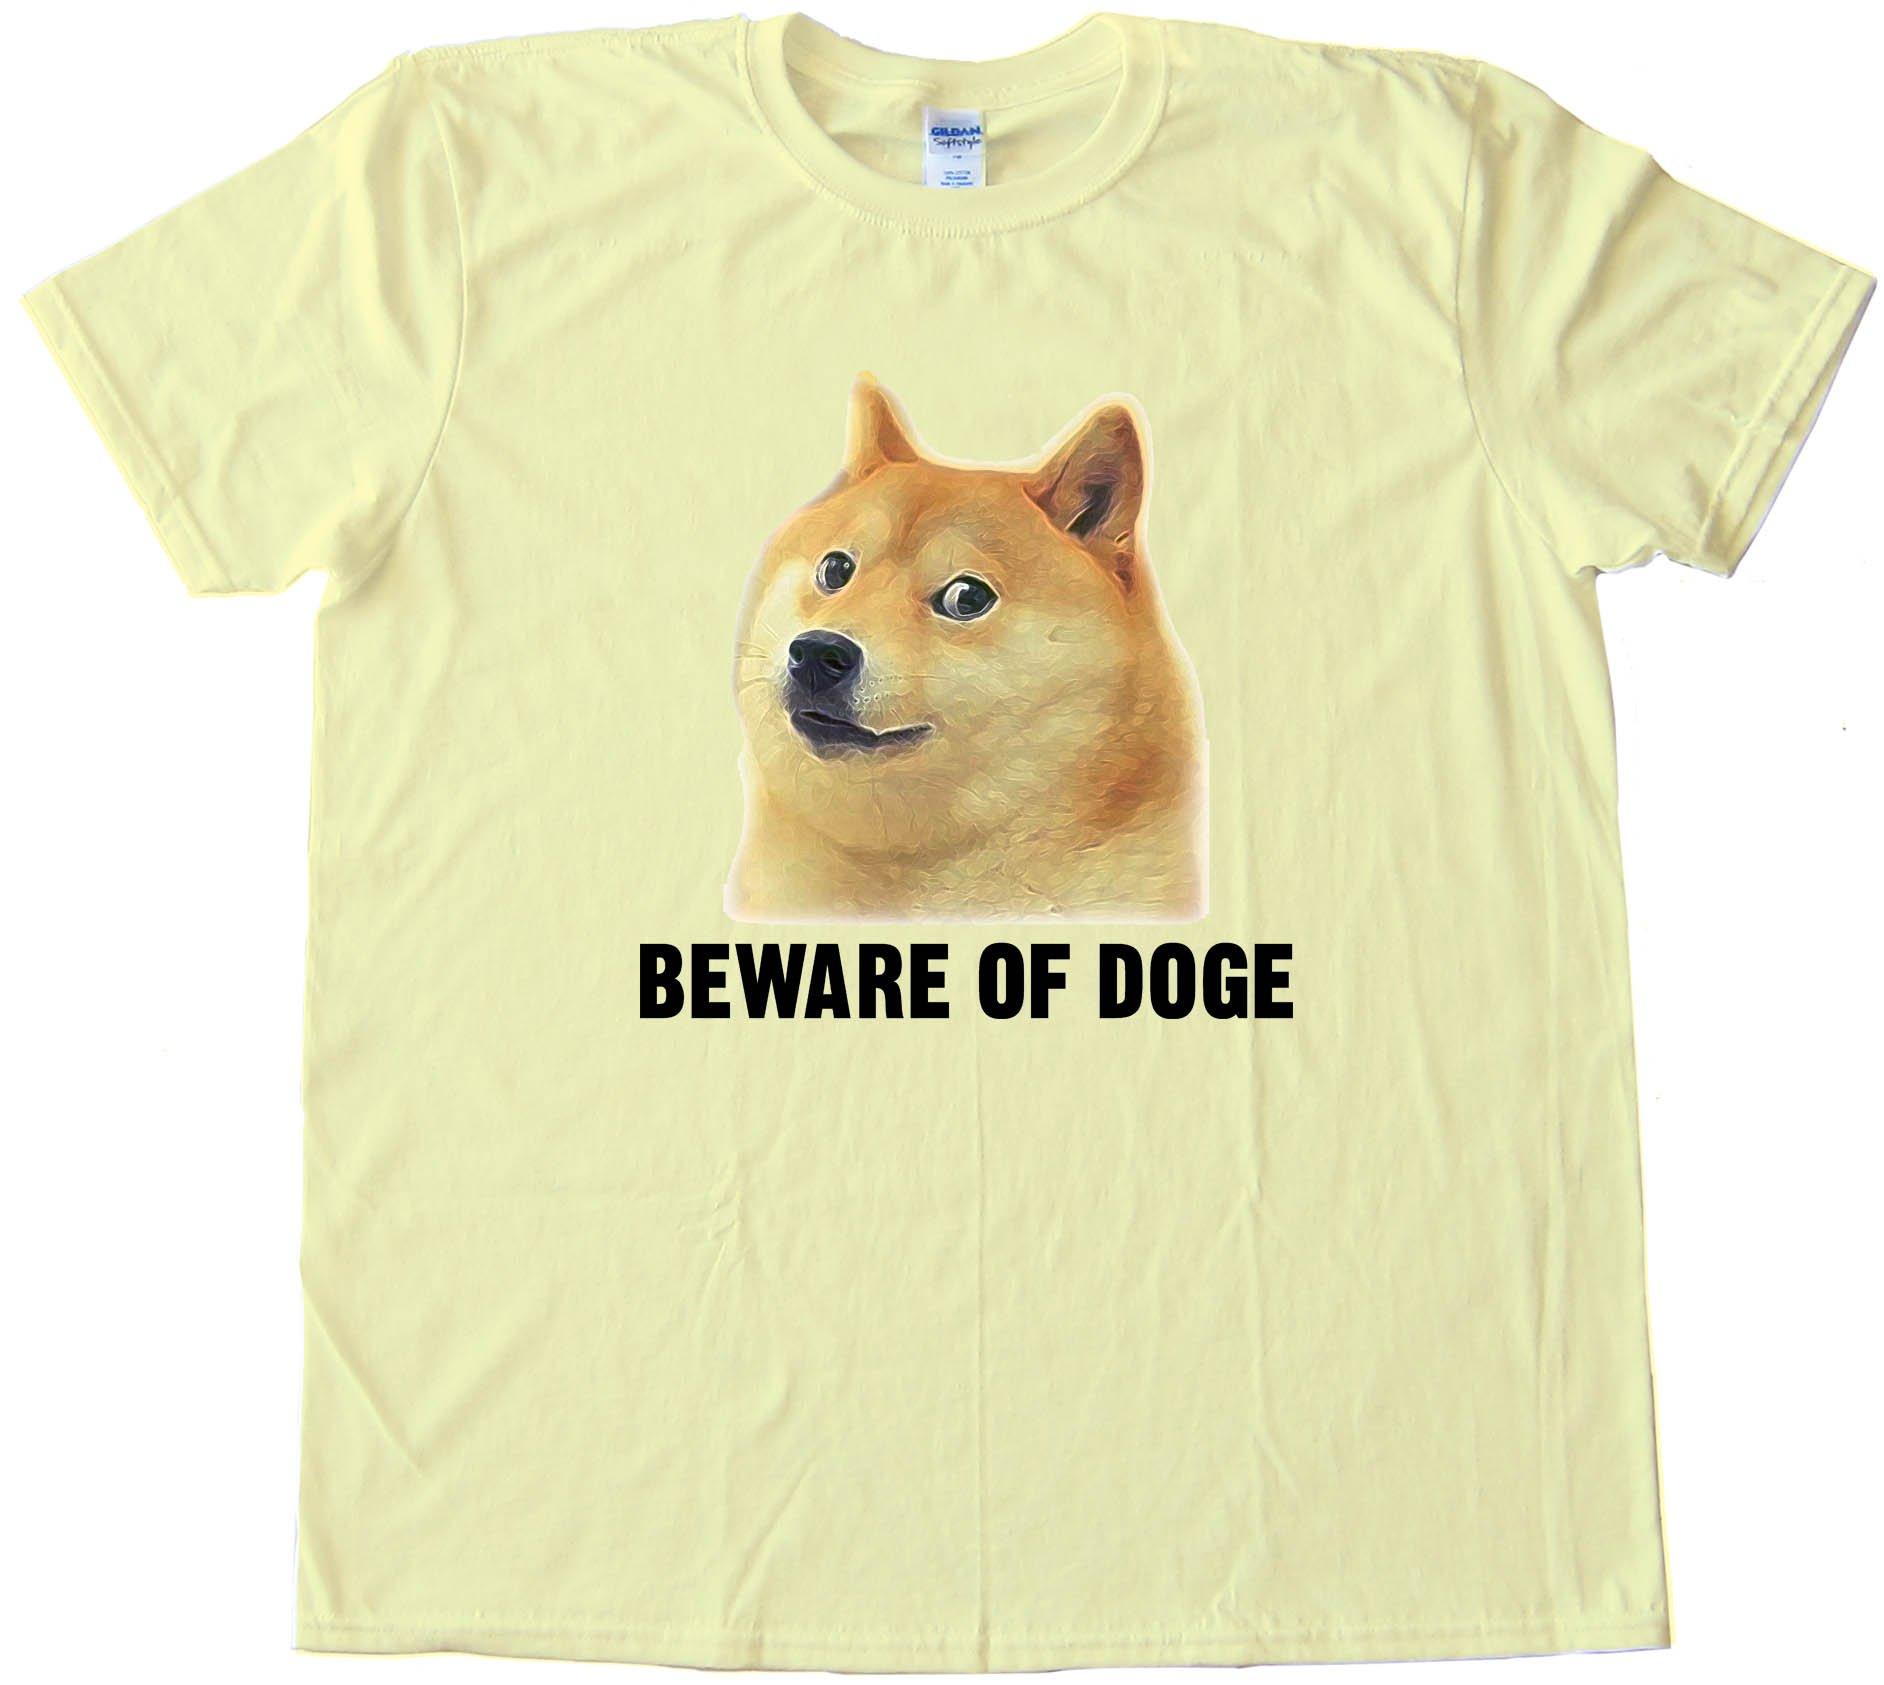 Doge shibe original - photo#4